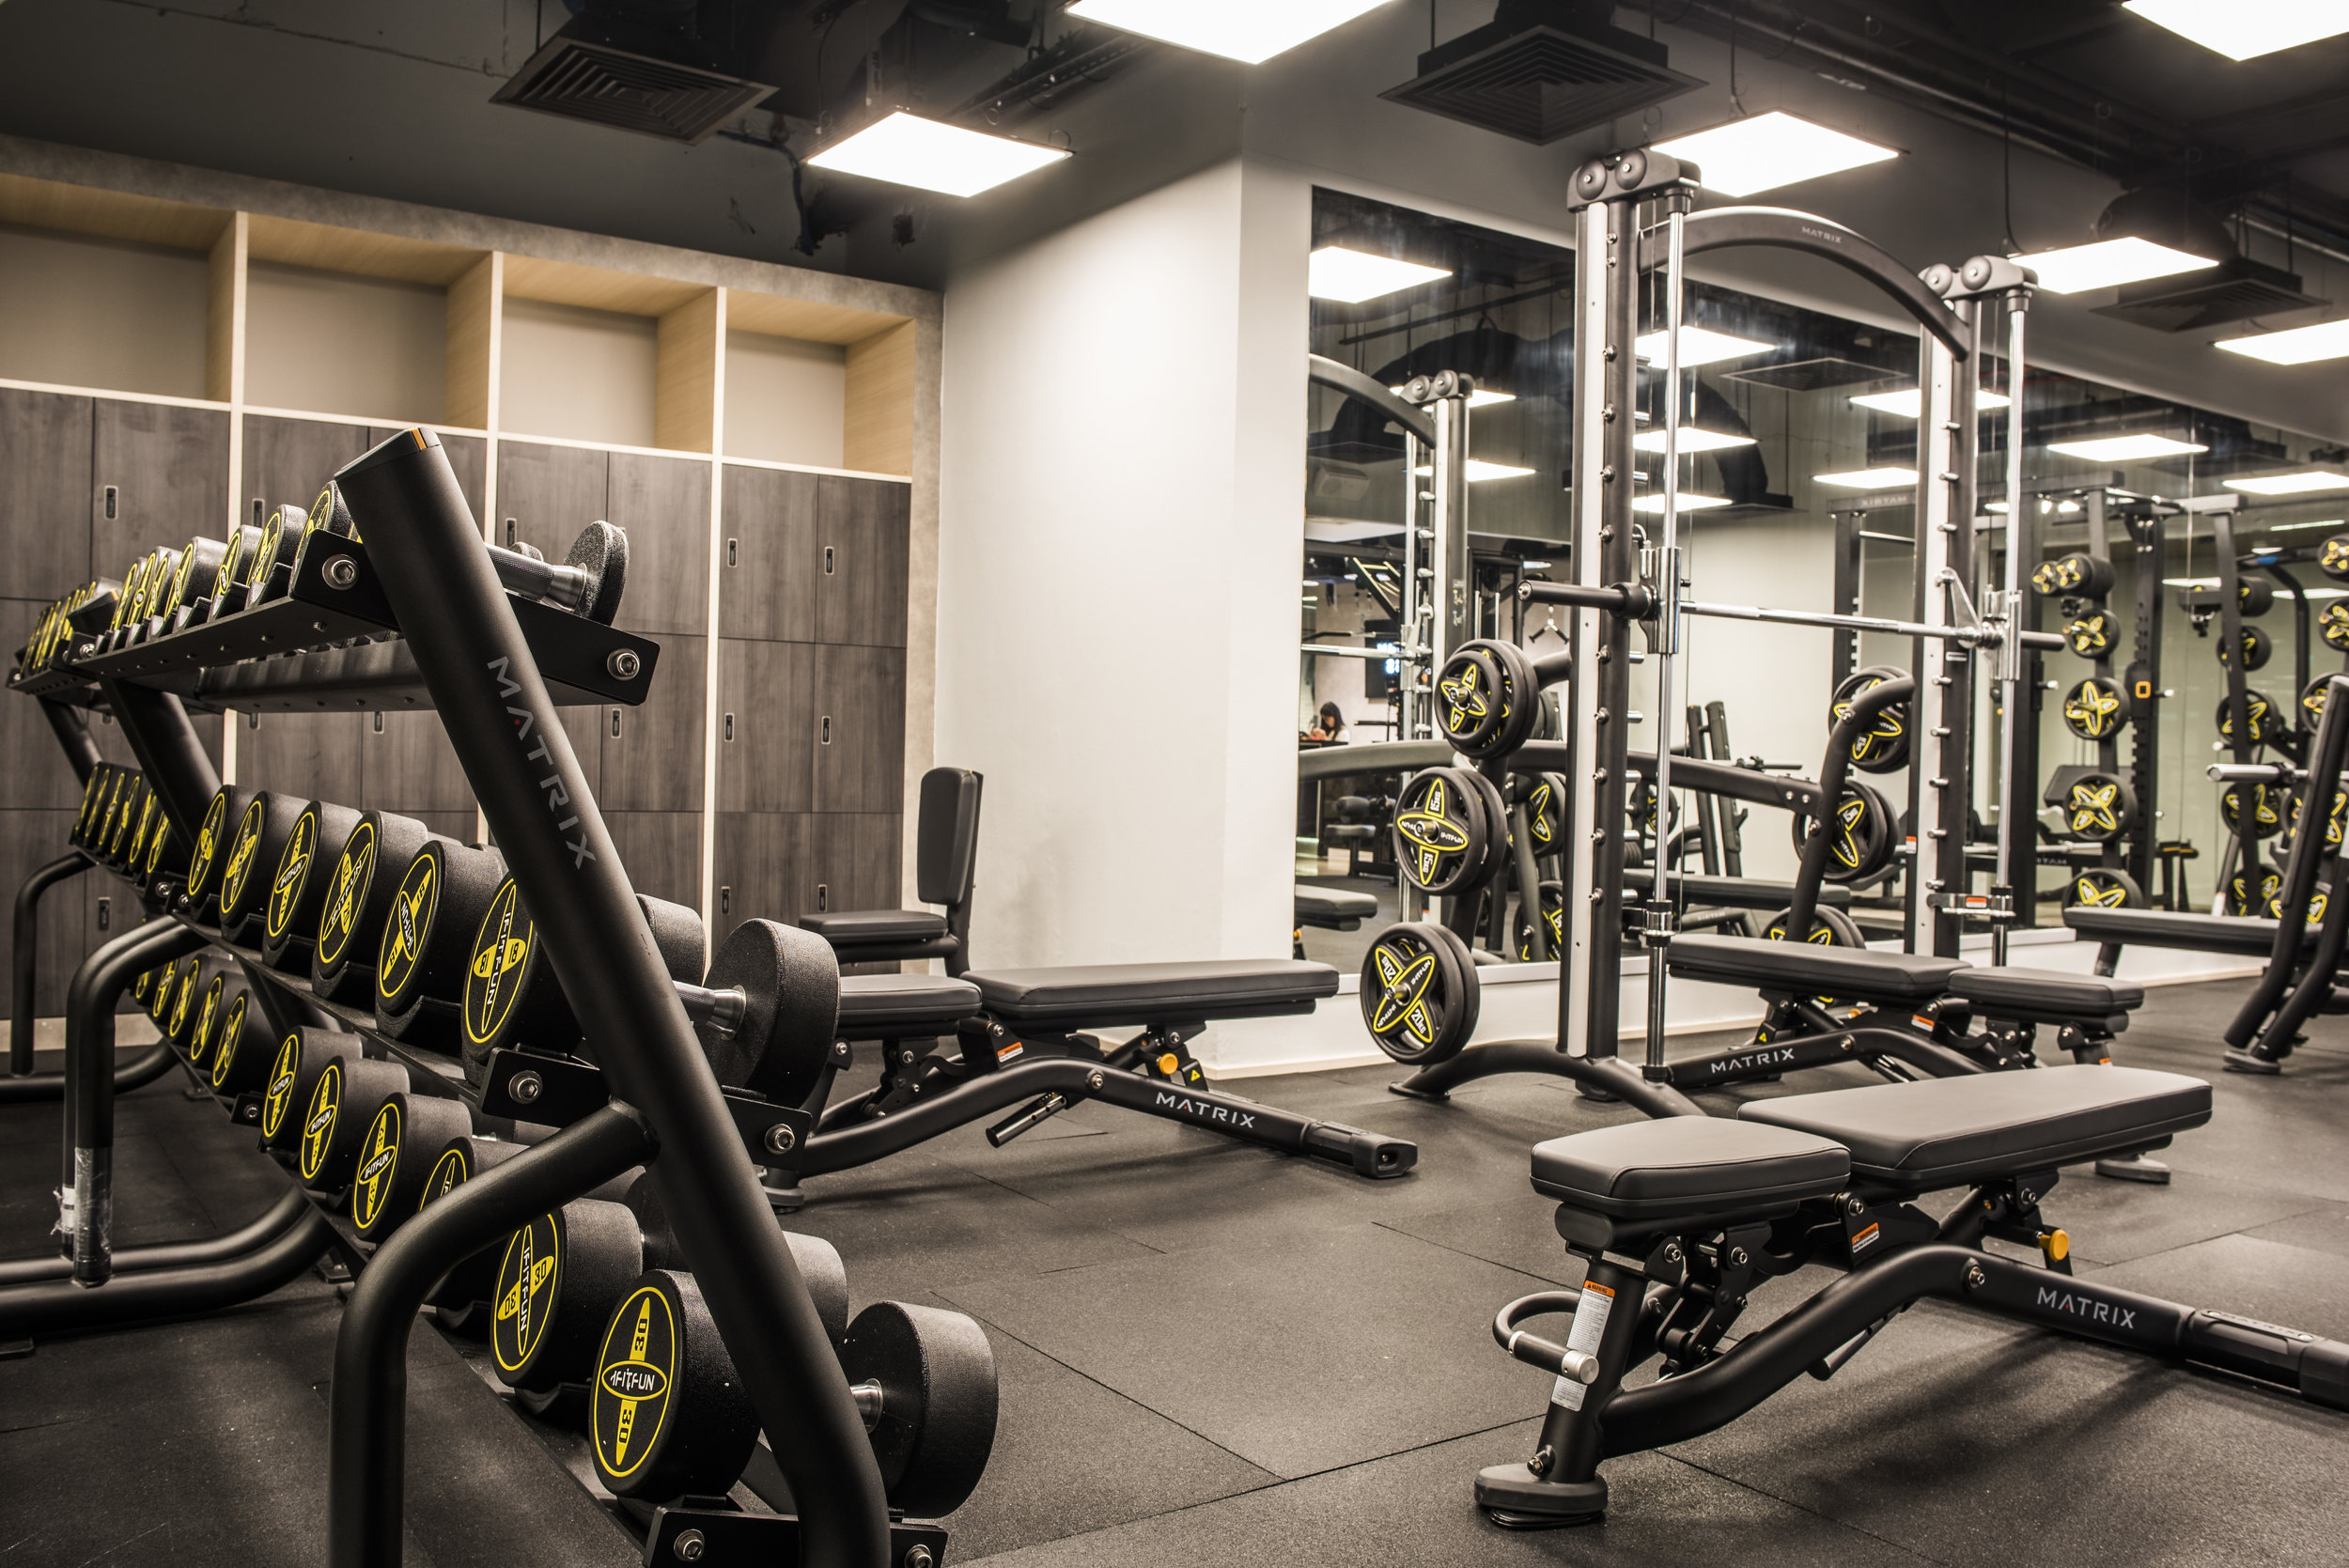 Platinum Fitness - Interior Image 4.jpg